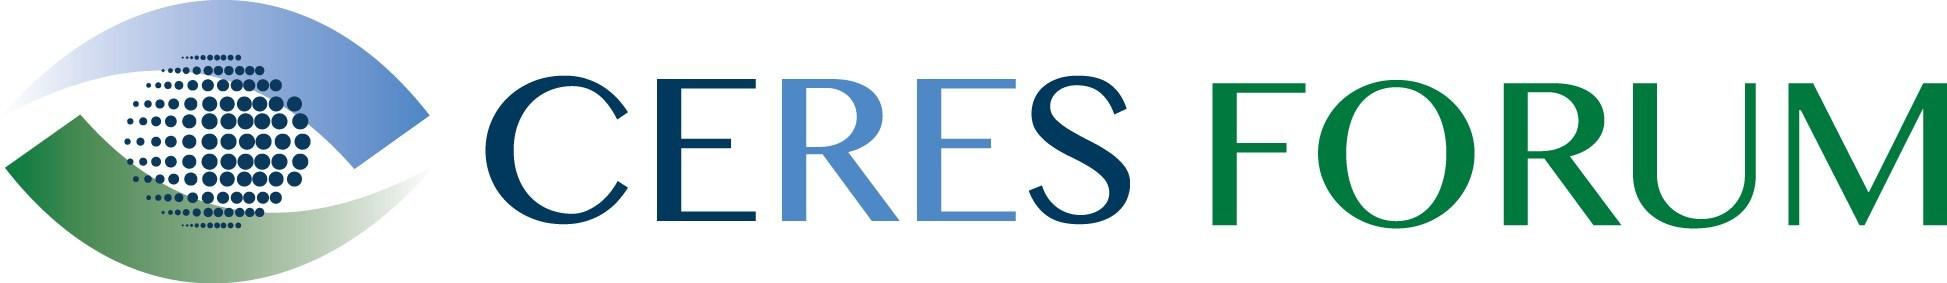 The CERES Forum Logo